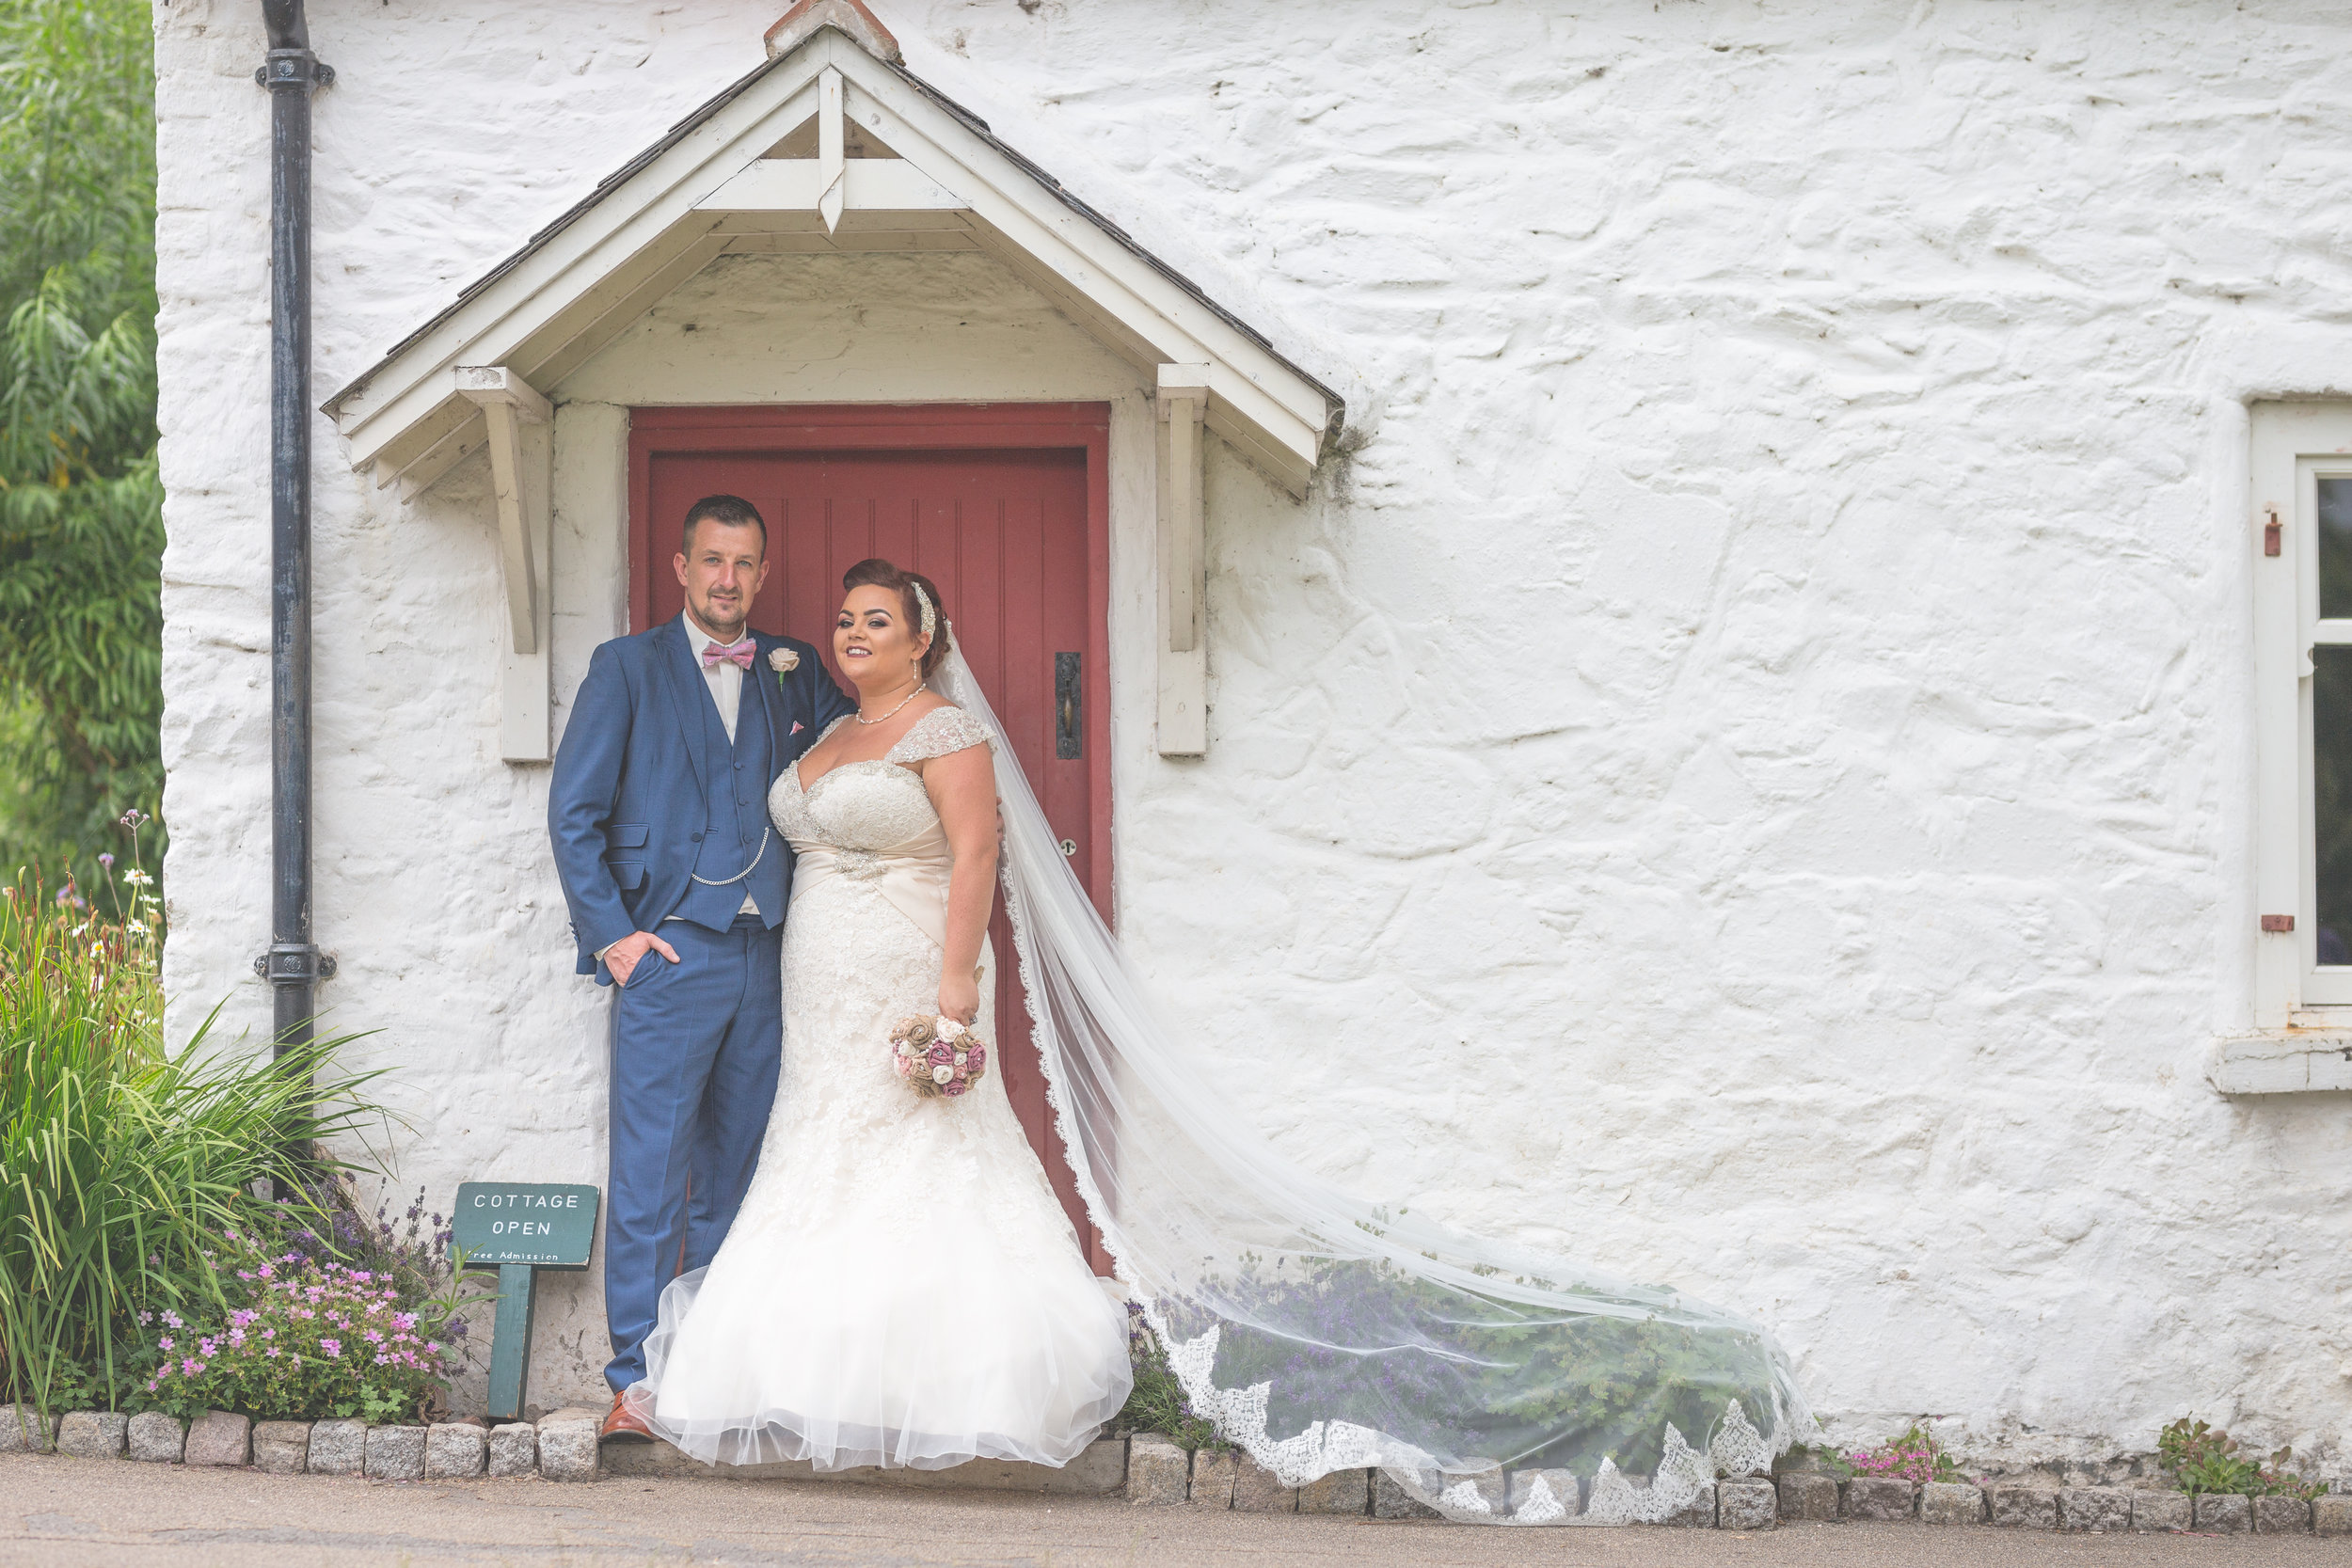 Antoinette & Stephen - Portraits   Brian McEwan Photography   Wedding Photographer Northern Ireland 3.jpg